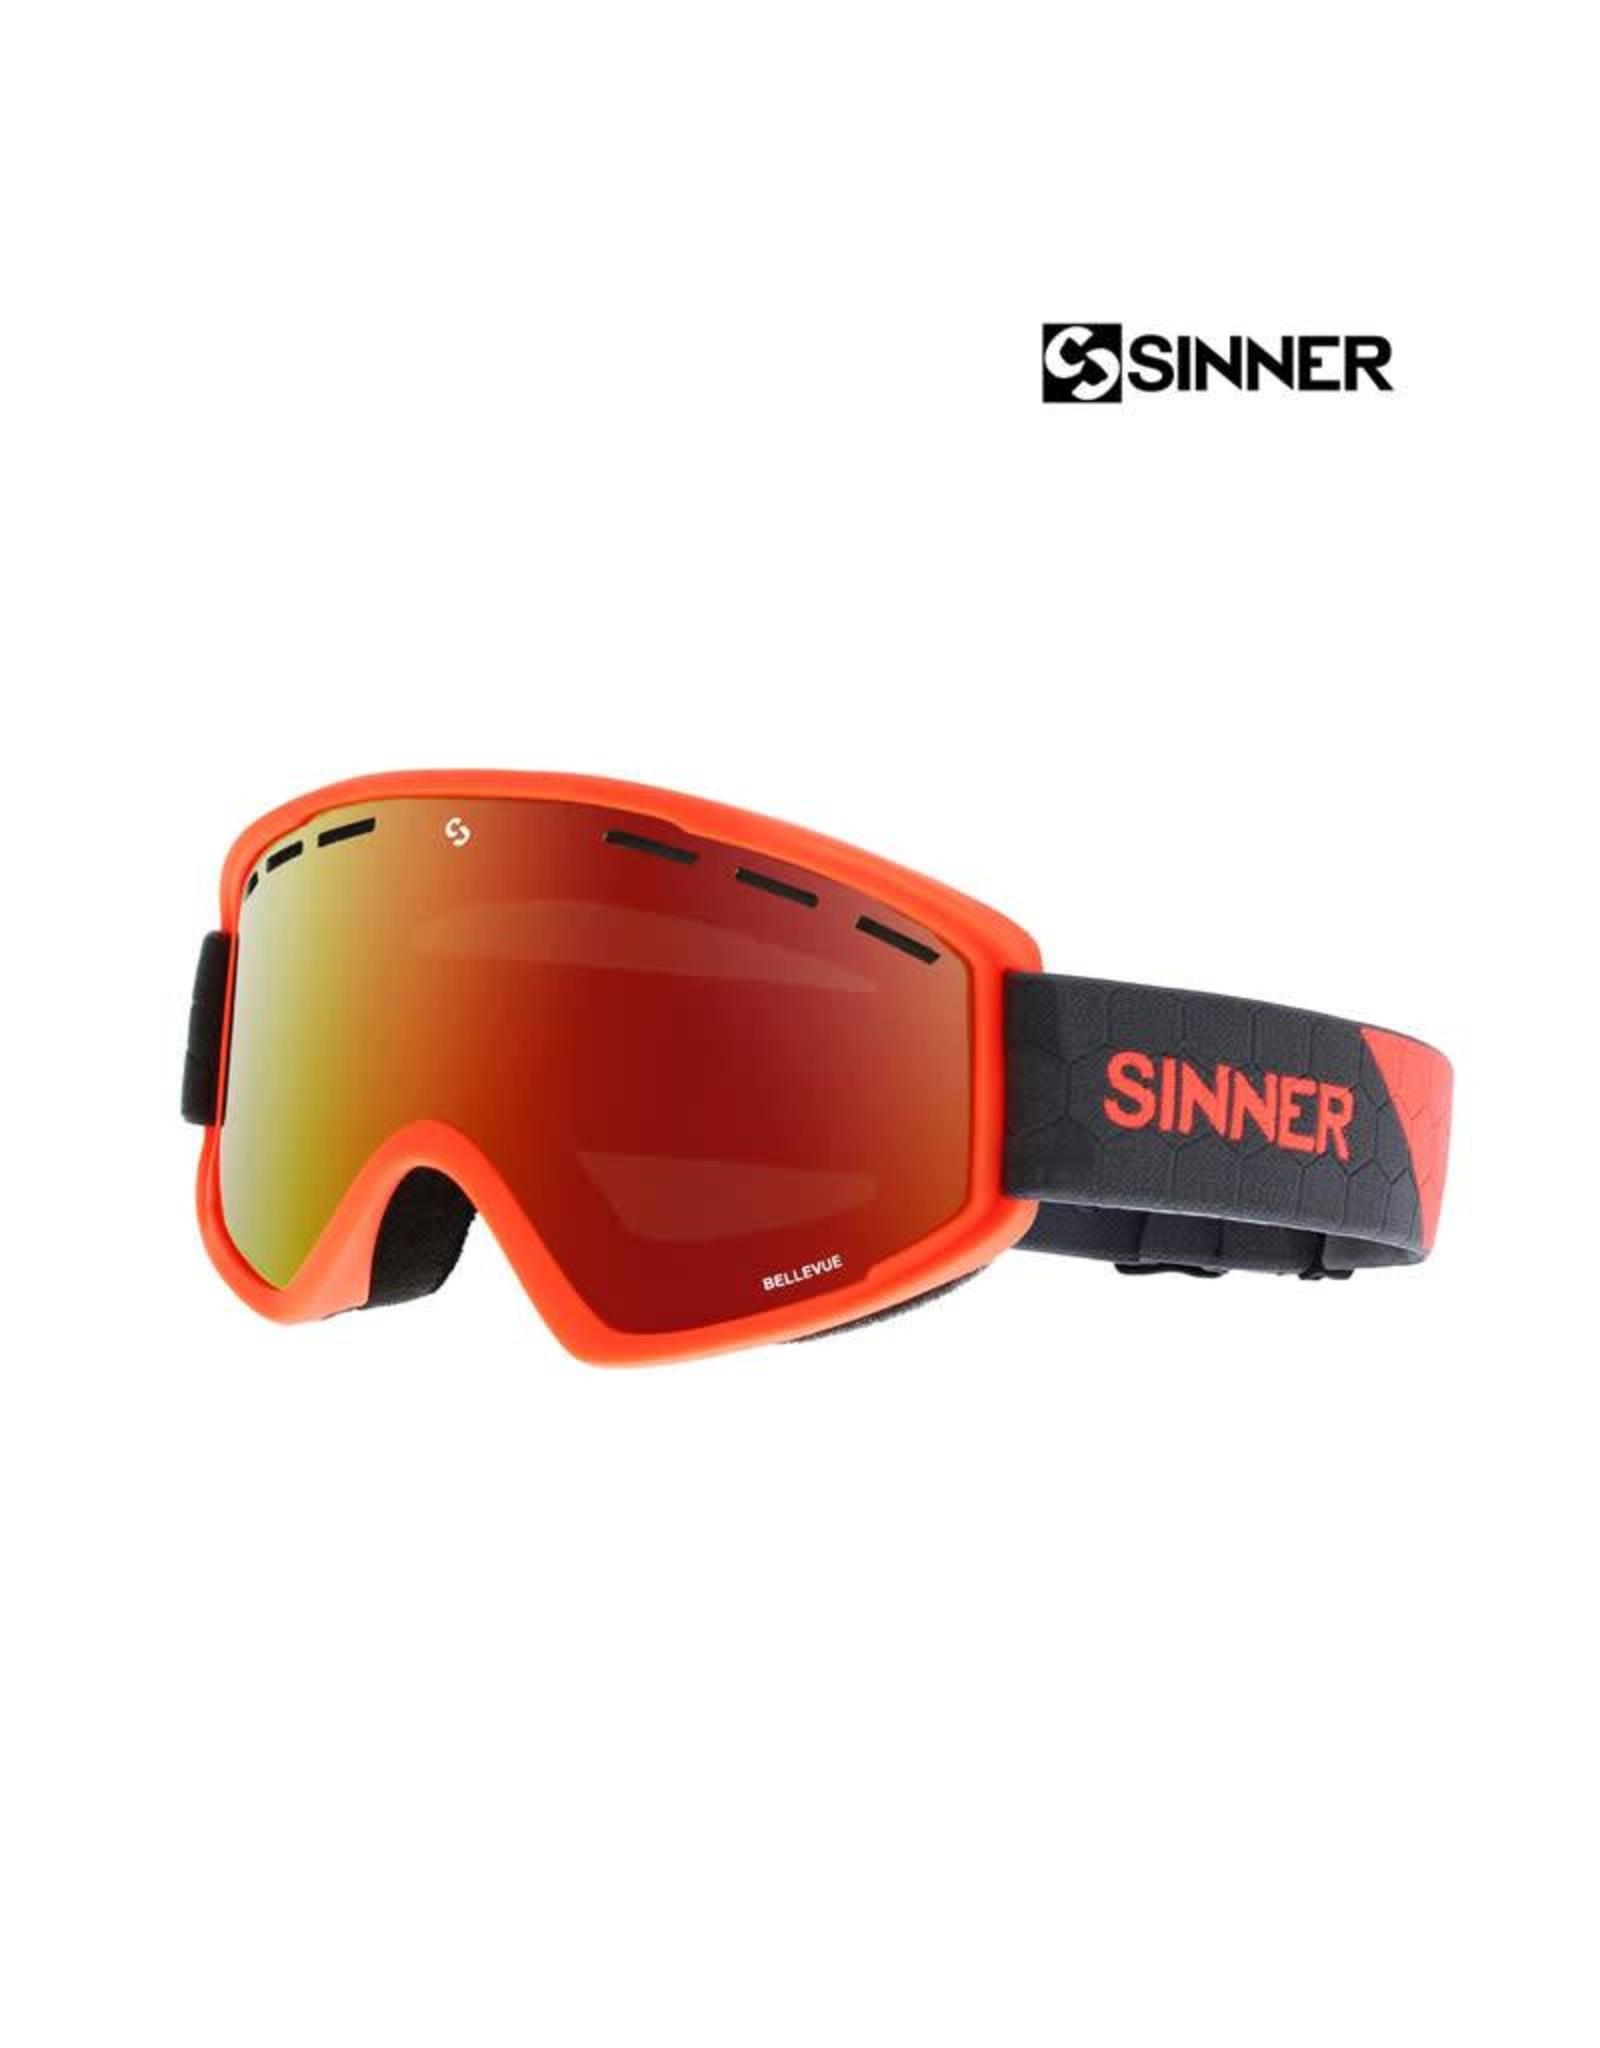 SINNER SKIBRIL SINNER BELLEVUE MT NEON OR-Full RED REVO